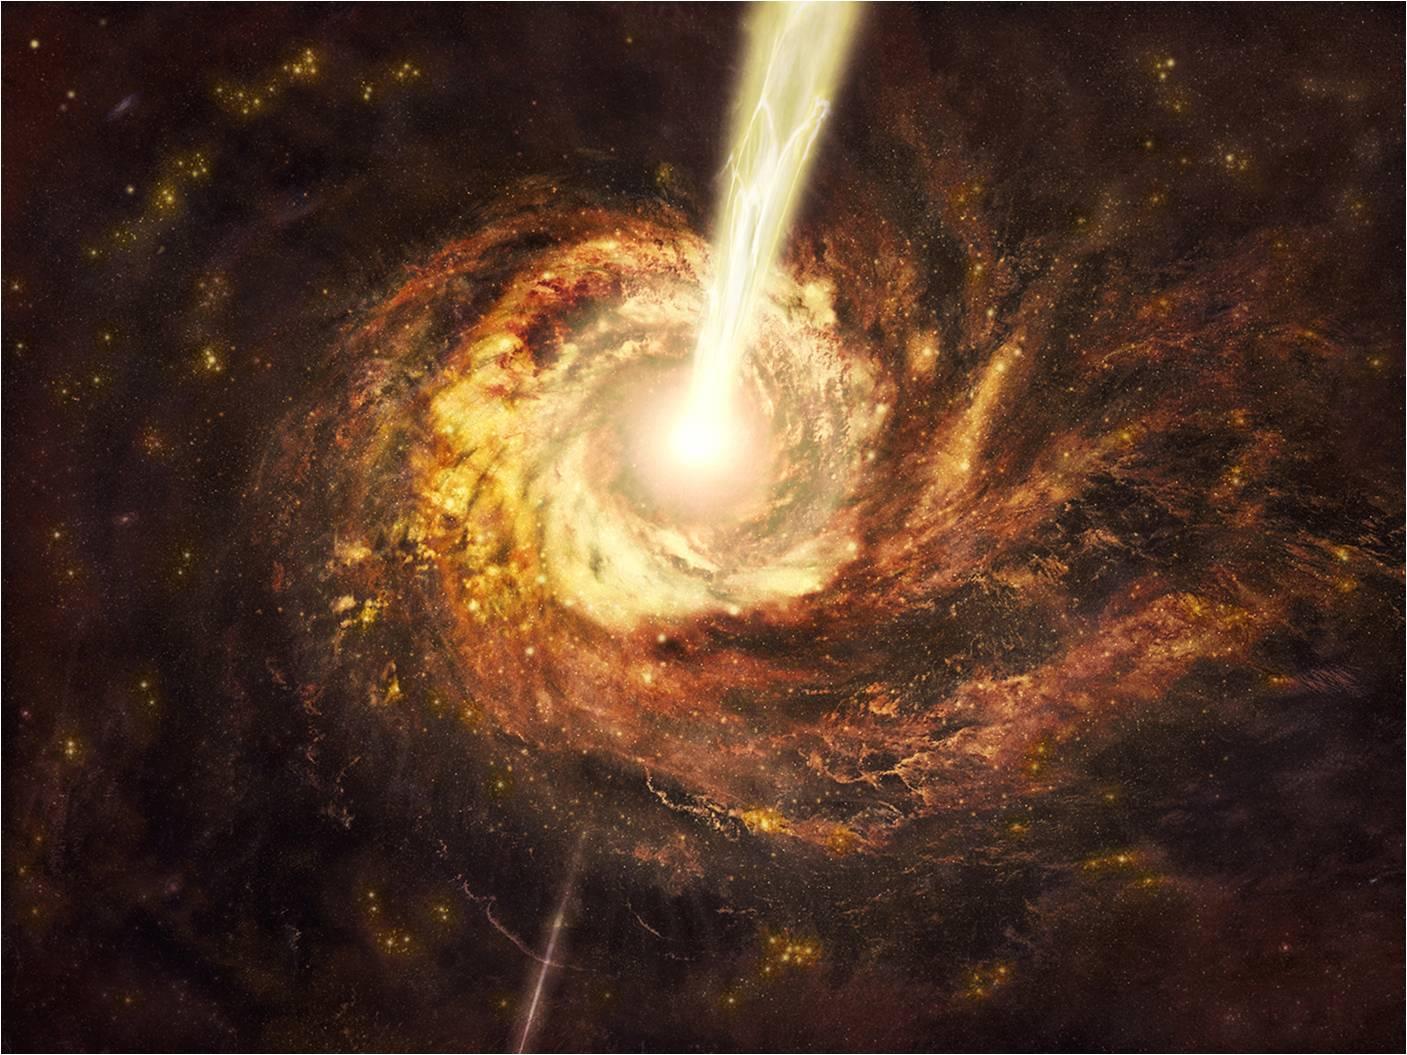 Documentaire Les clés de l'univers – Tempêtes de feu